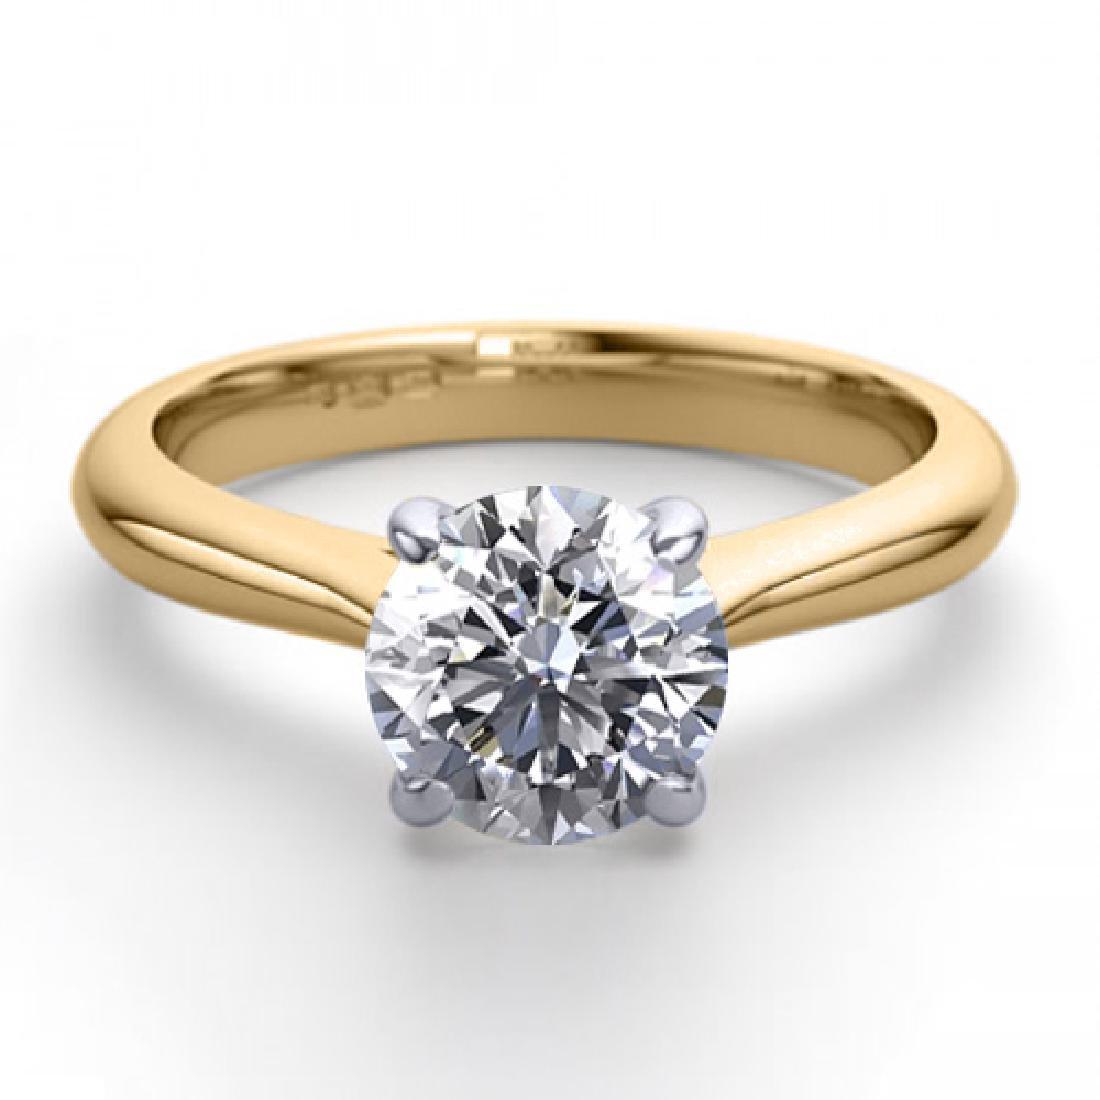 18K 2Tone Gold Jewelry 1.52 ctw Natural Diamond